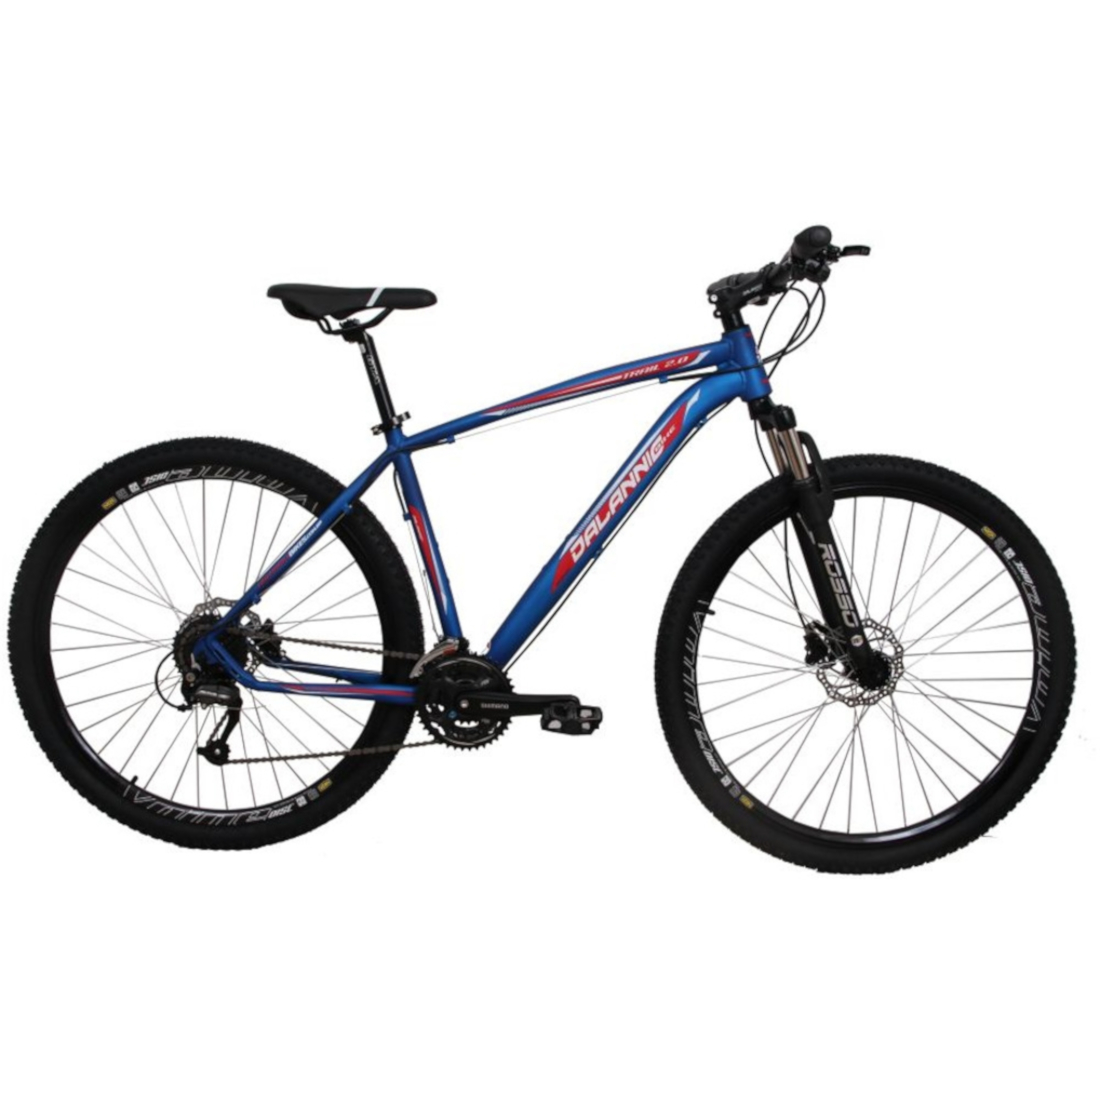 Bicicleta Aro 29 Alumínio 27V Freio Hidráulico Trail Azul